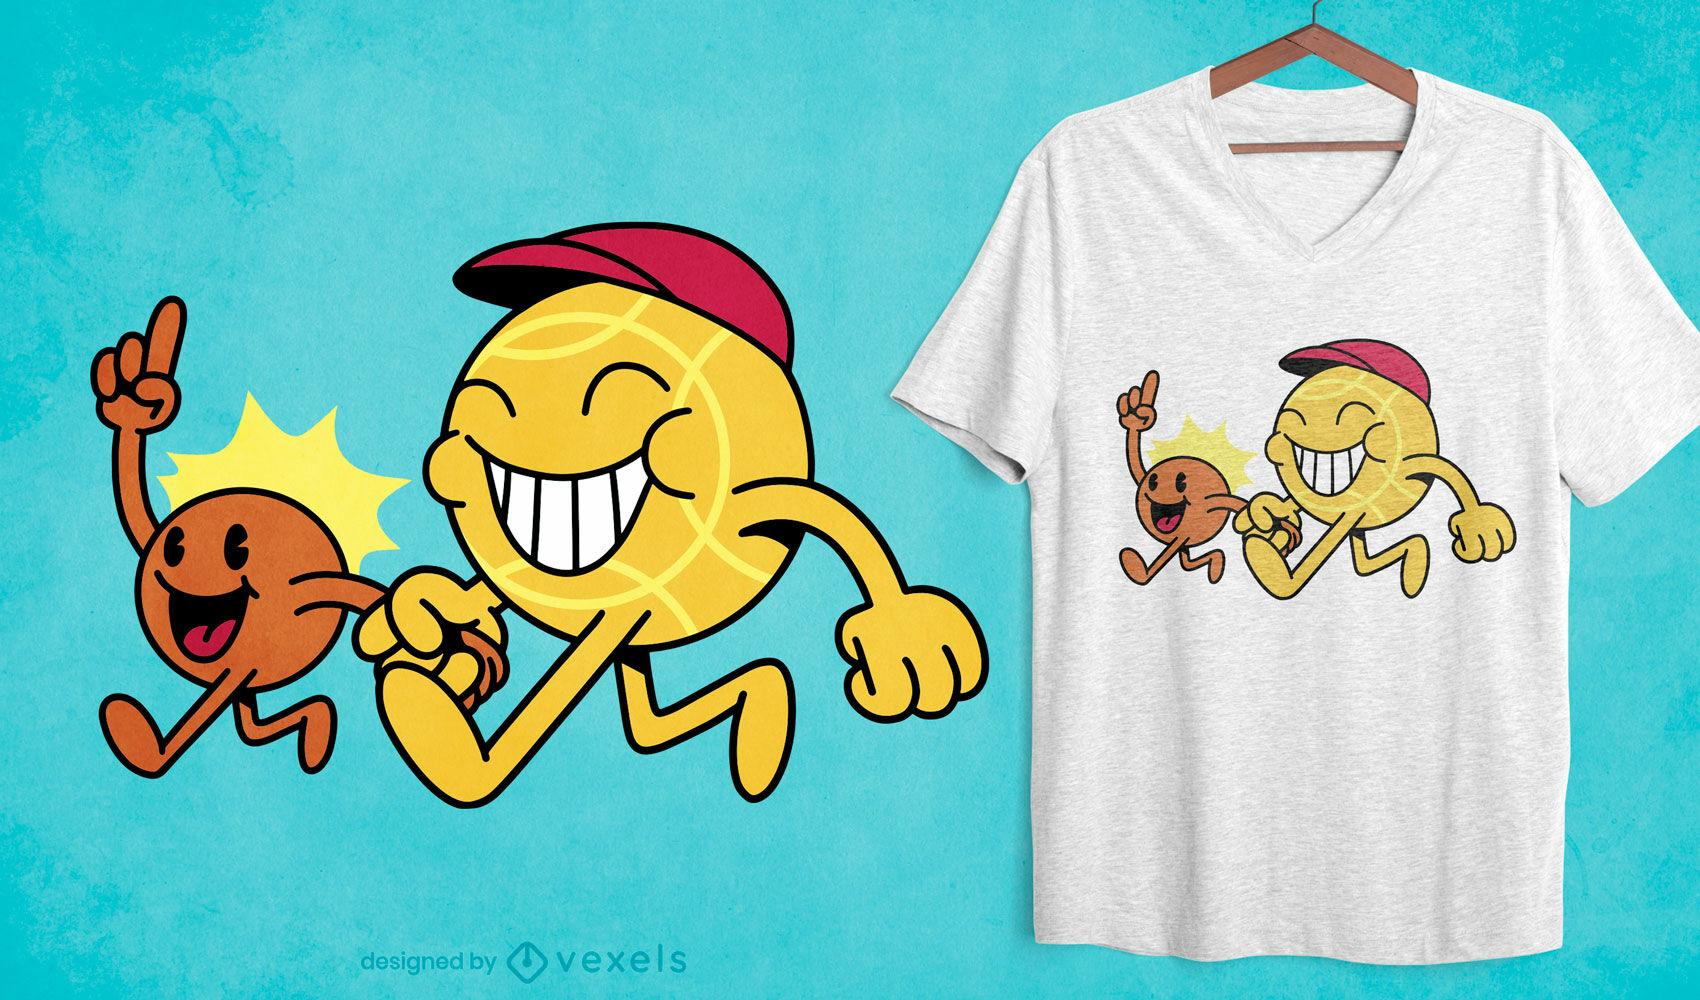 Diseño de camiseta de dibujos animados franceses de petanca.